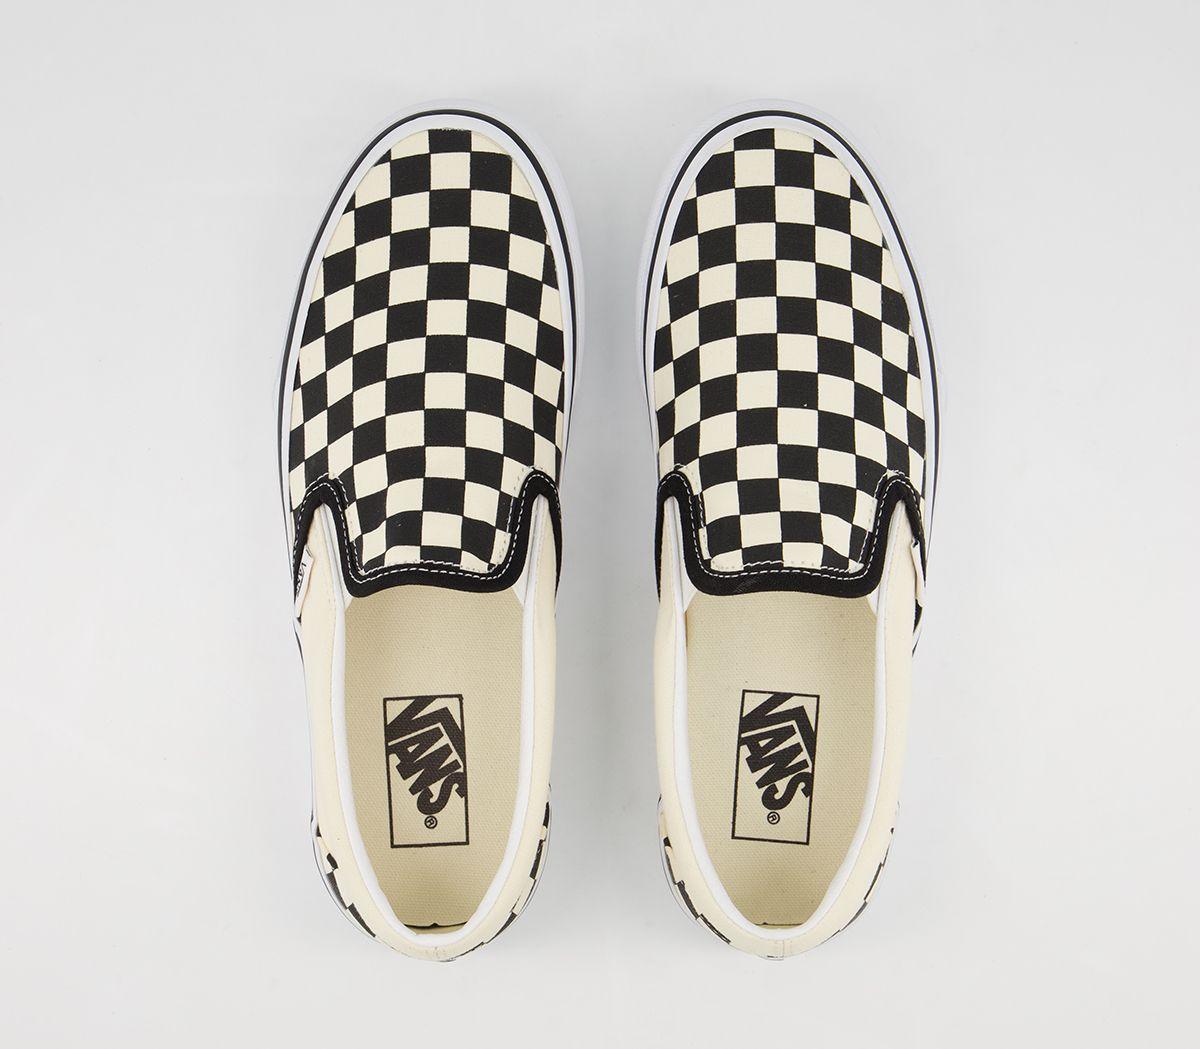 702dee7de0822a Vans Classic Slip On Platform Trainers Black White Checker - Hers ...